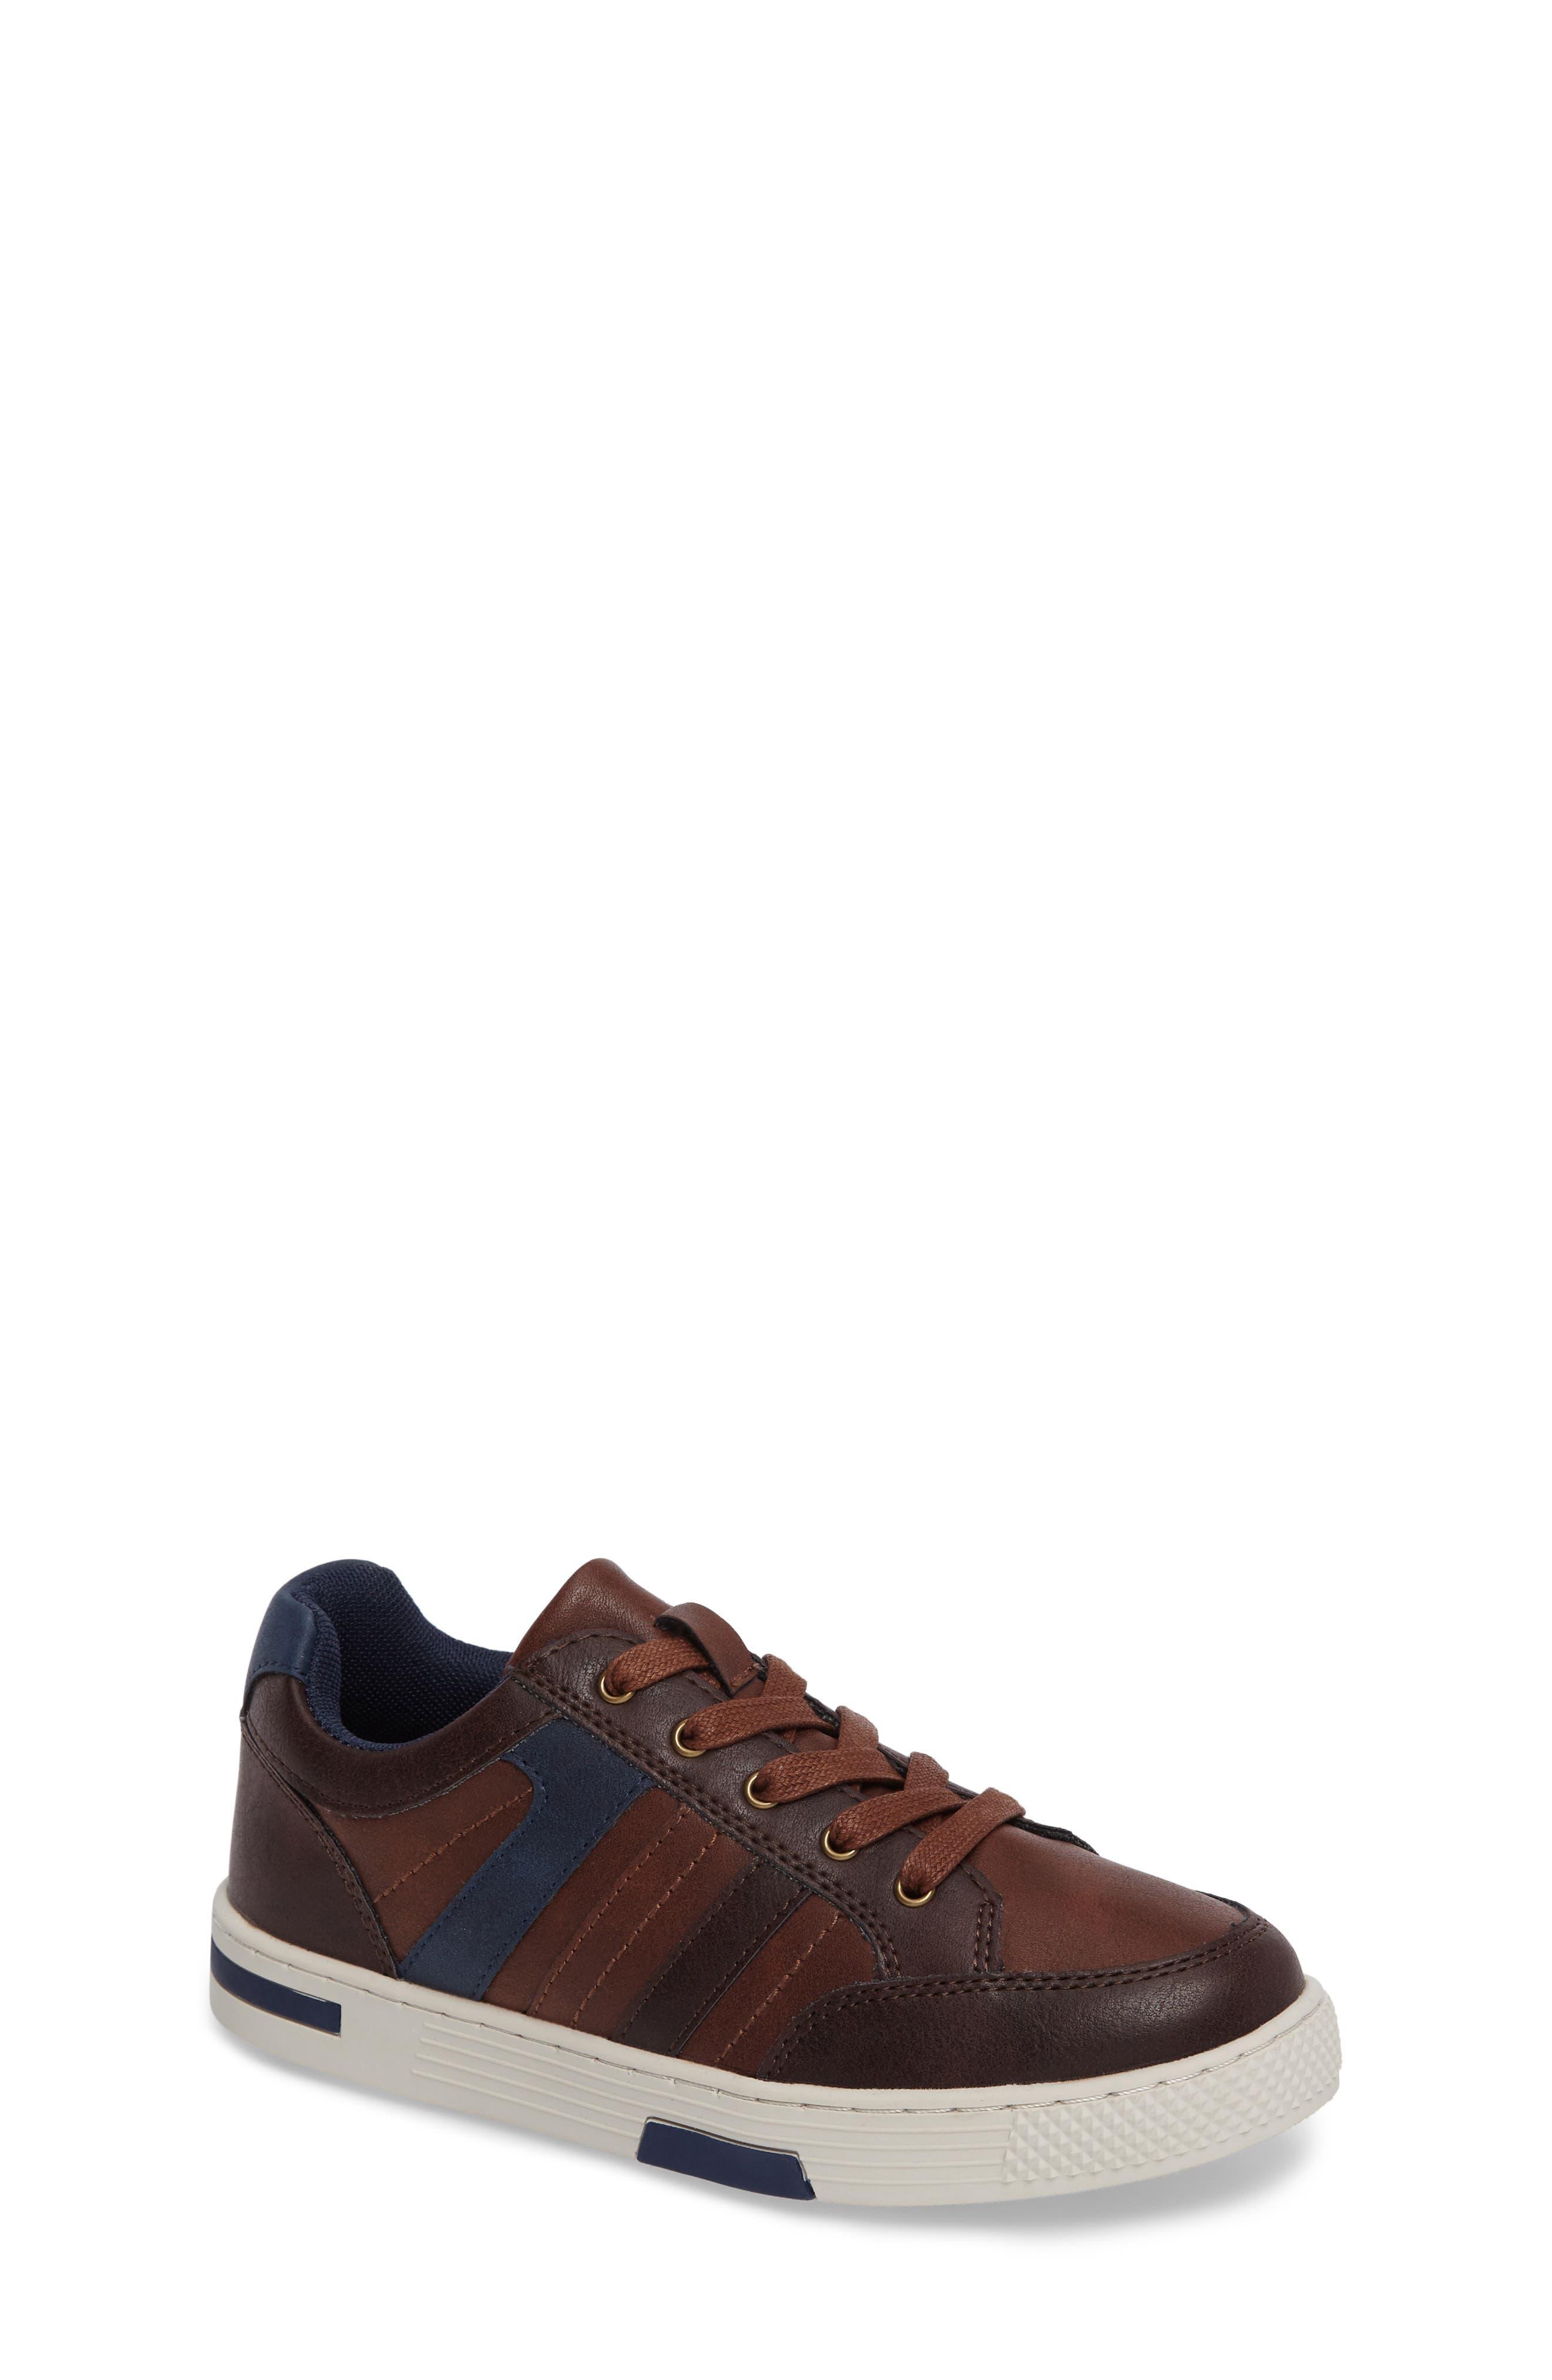 Trakk Sneaker,                         Main,                         color, 207